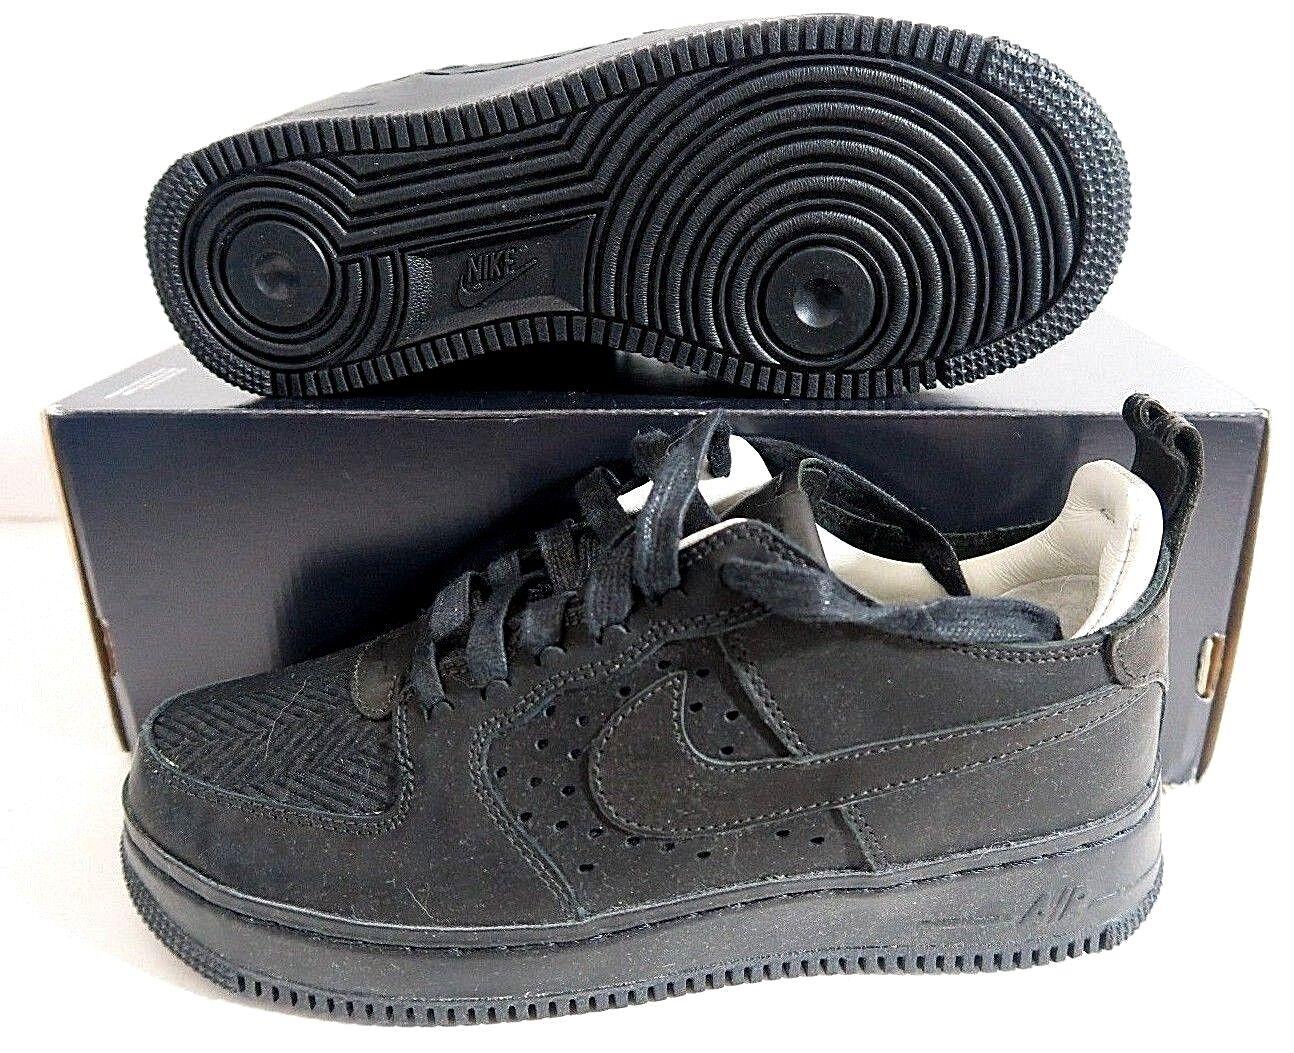 Nike Women's Air Force 1 Comfort Tech Craft Black 921072 001 Size 8  220